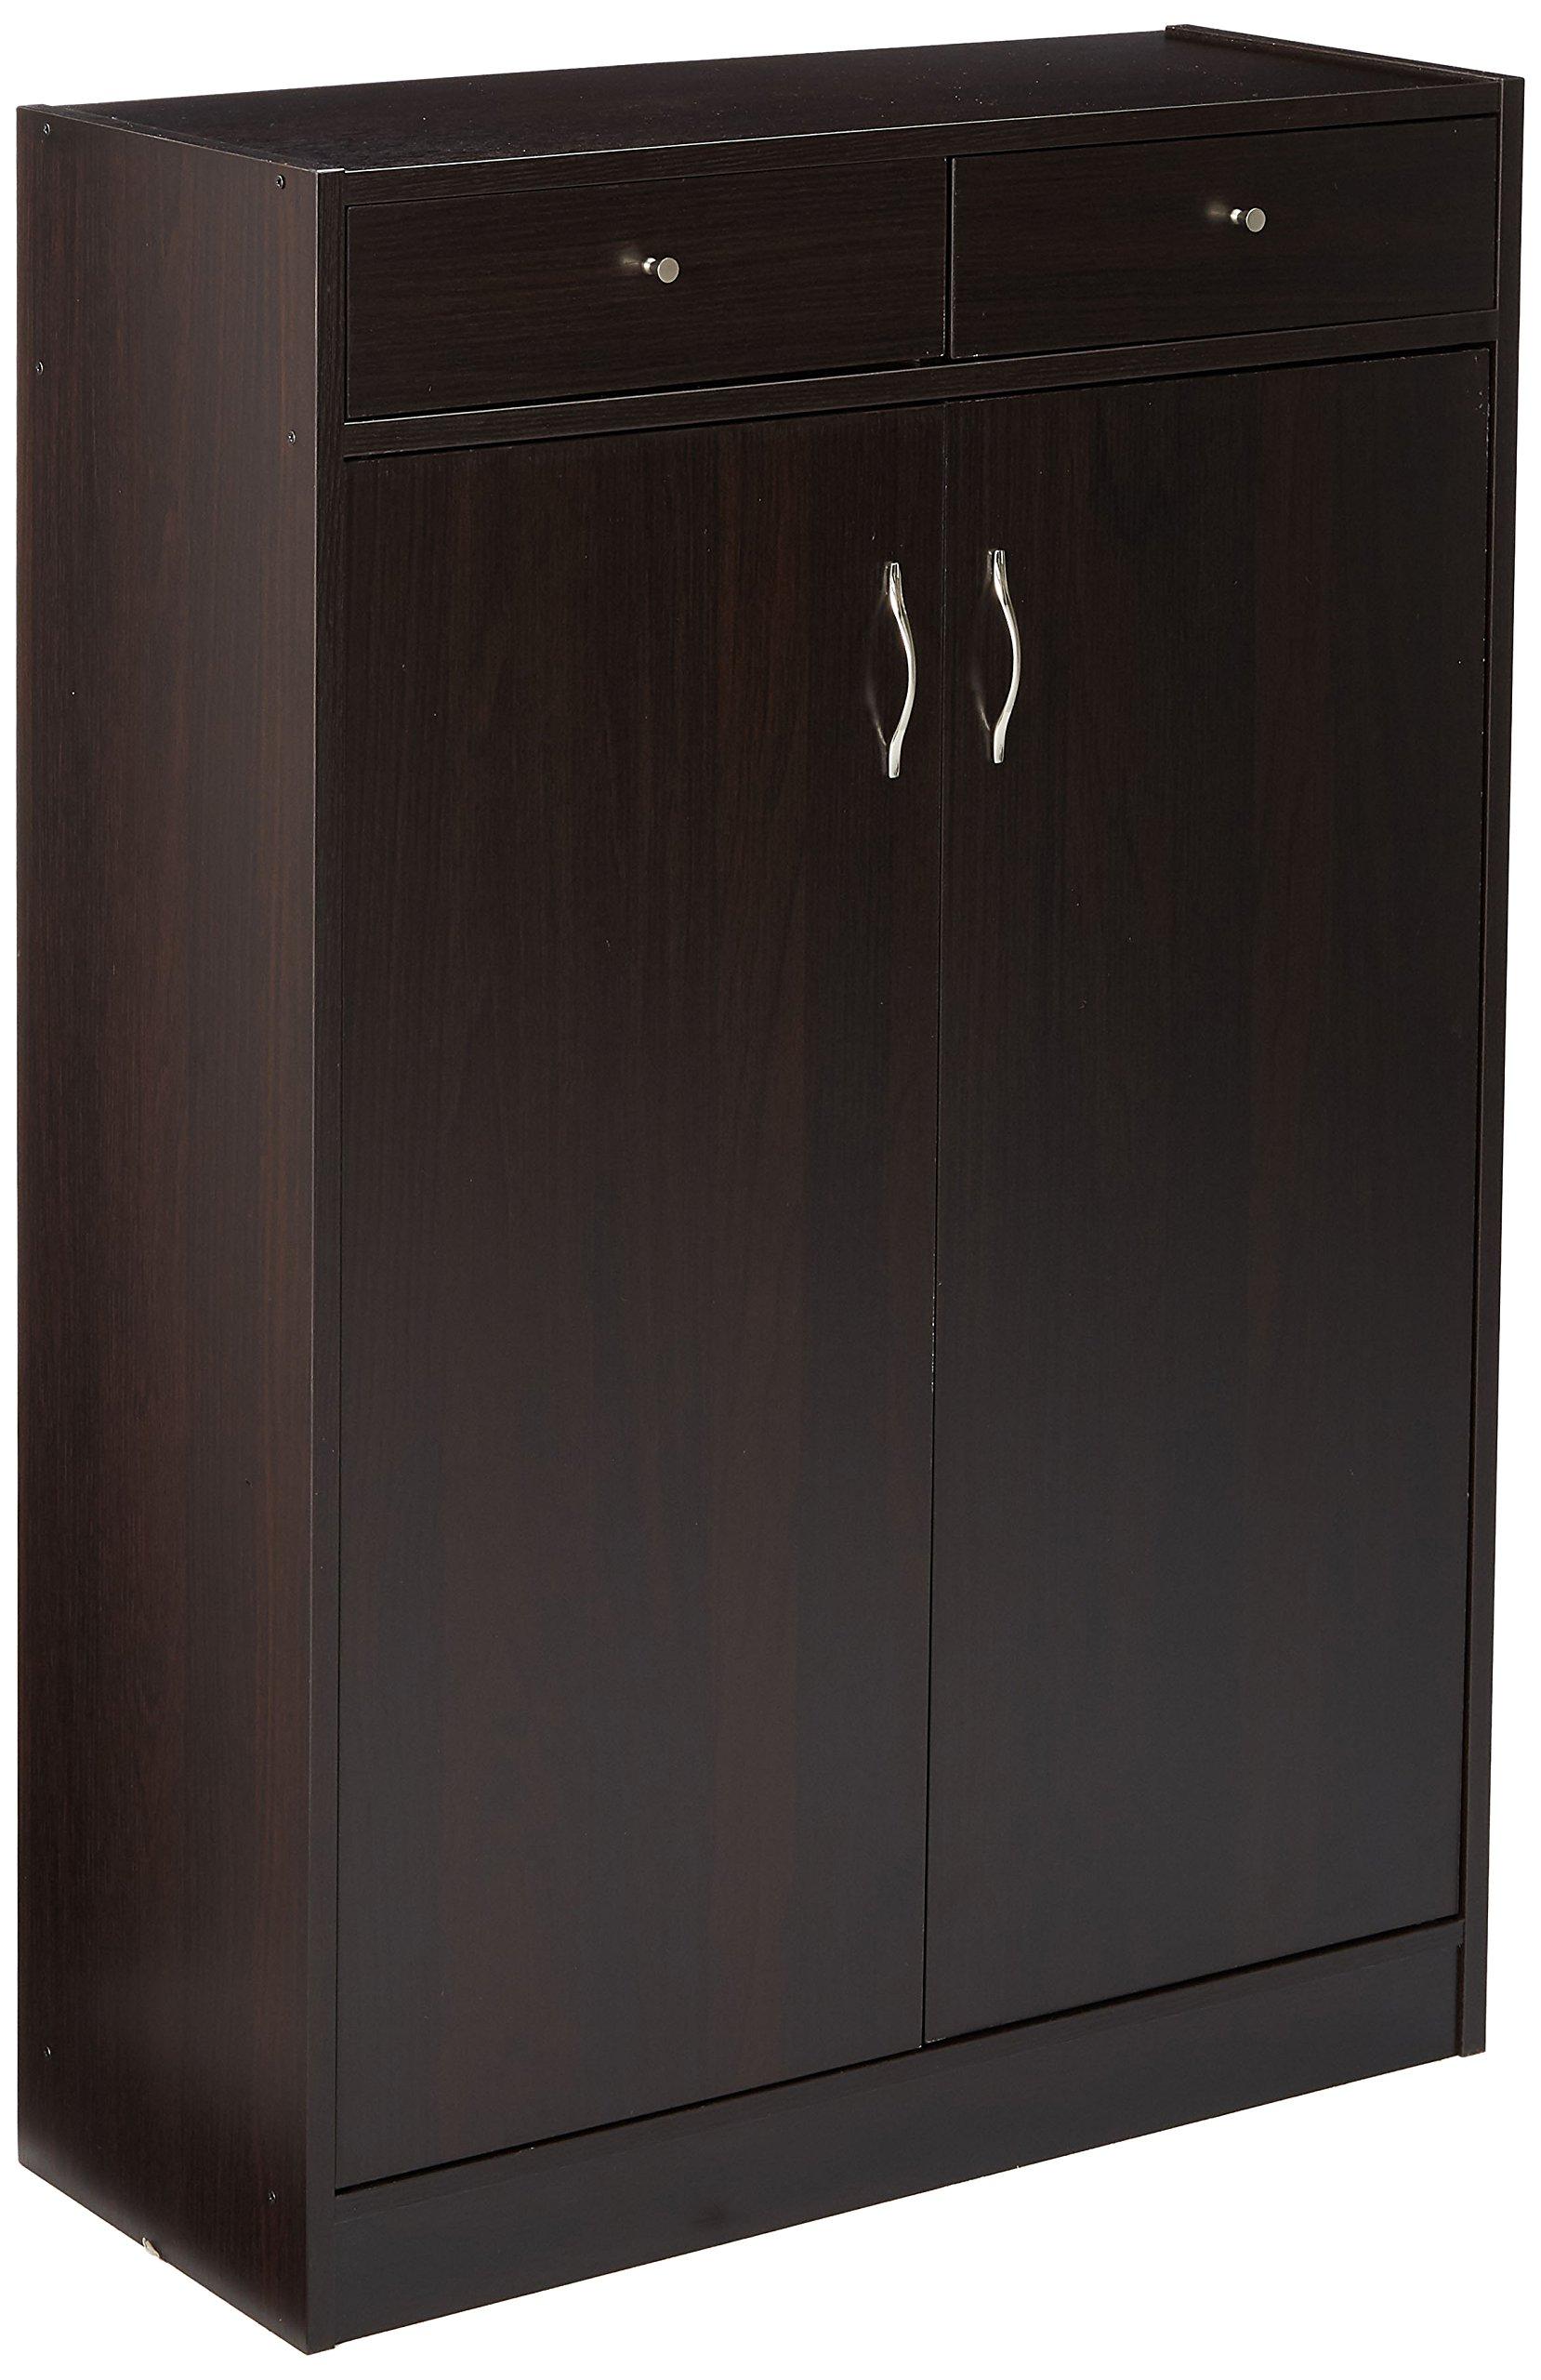 247SHOPATHOME 6138 Five Shelf Shoe Storage Cabinet